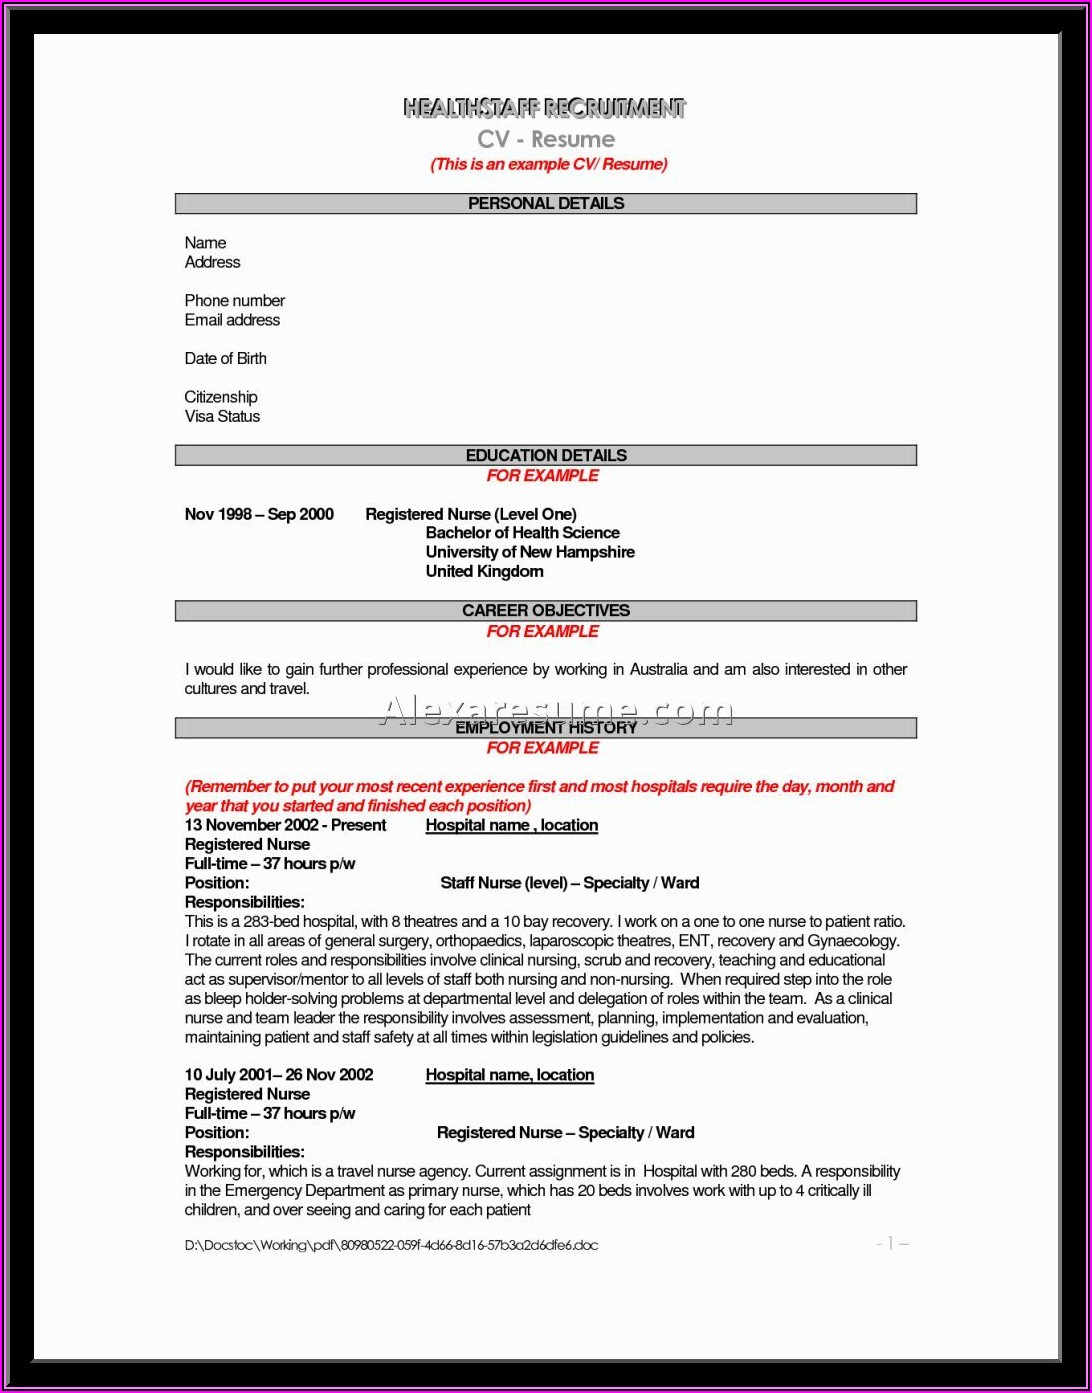 Registered Nurse Resumes Templates